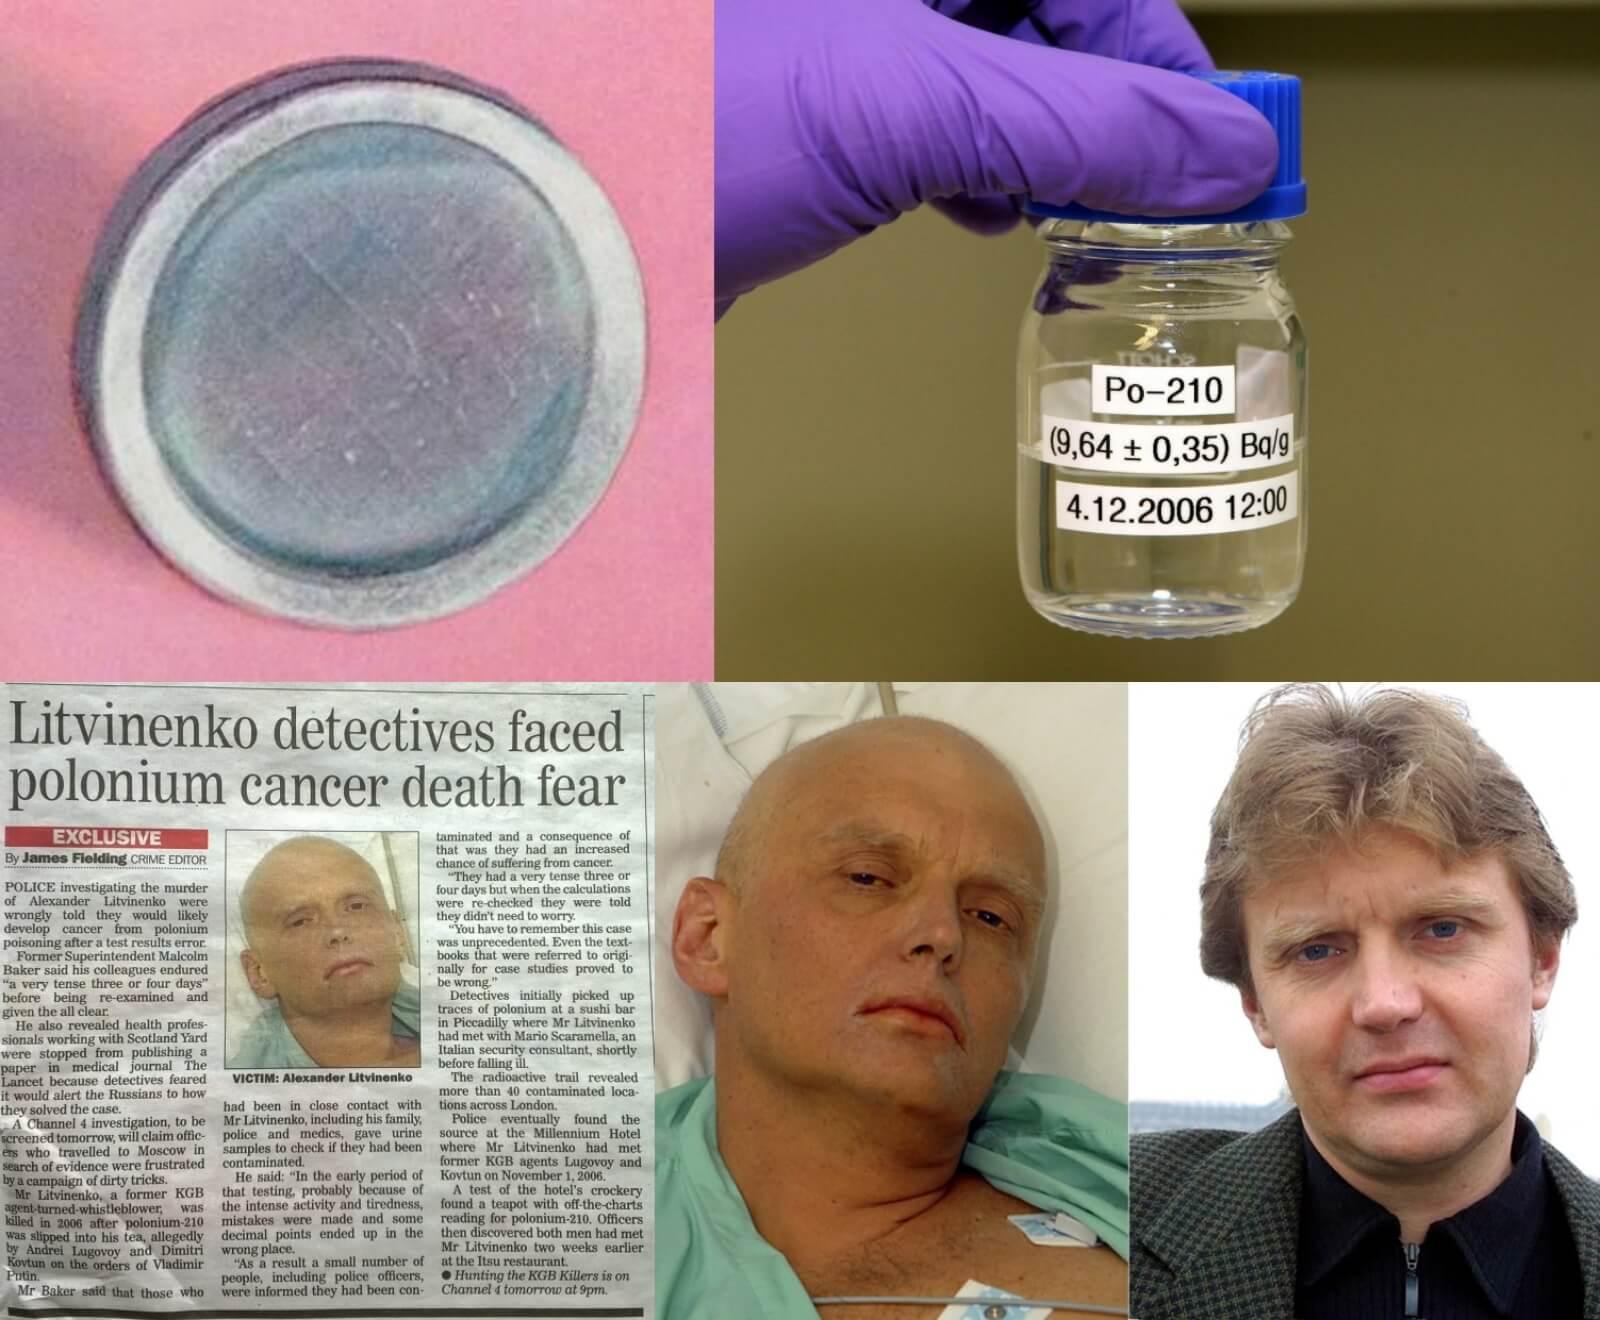 Polonium deadly poison